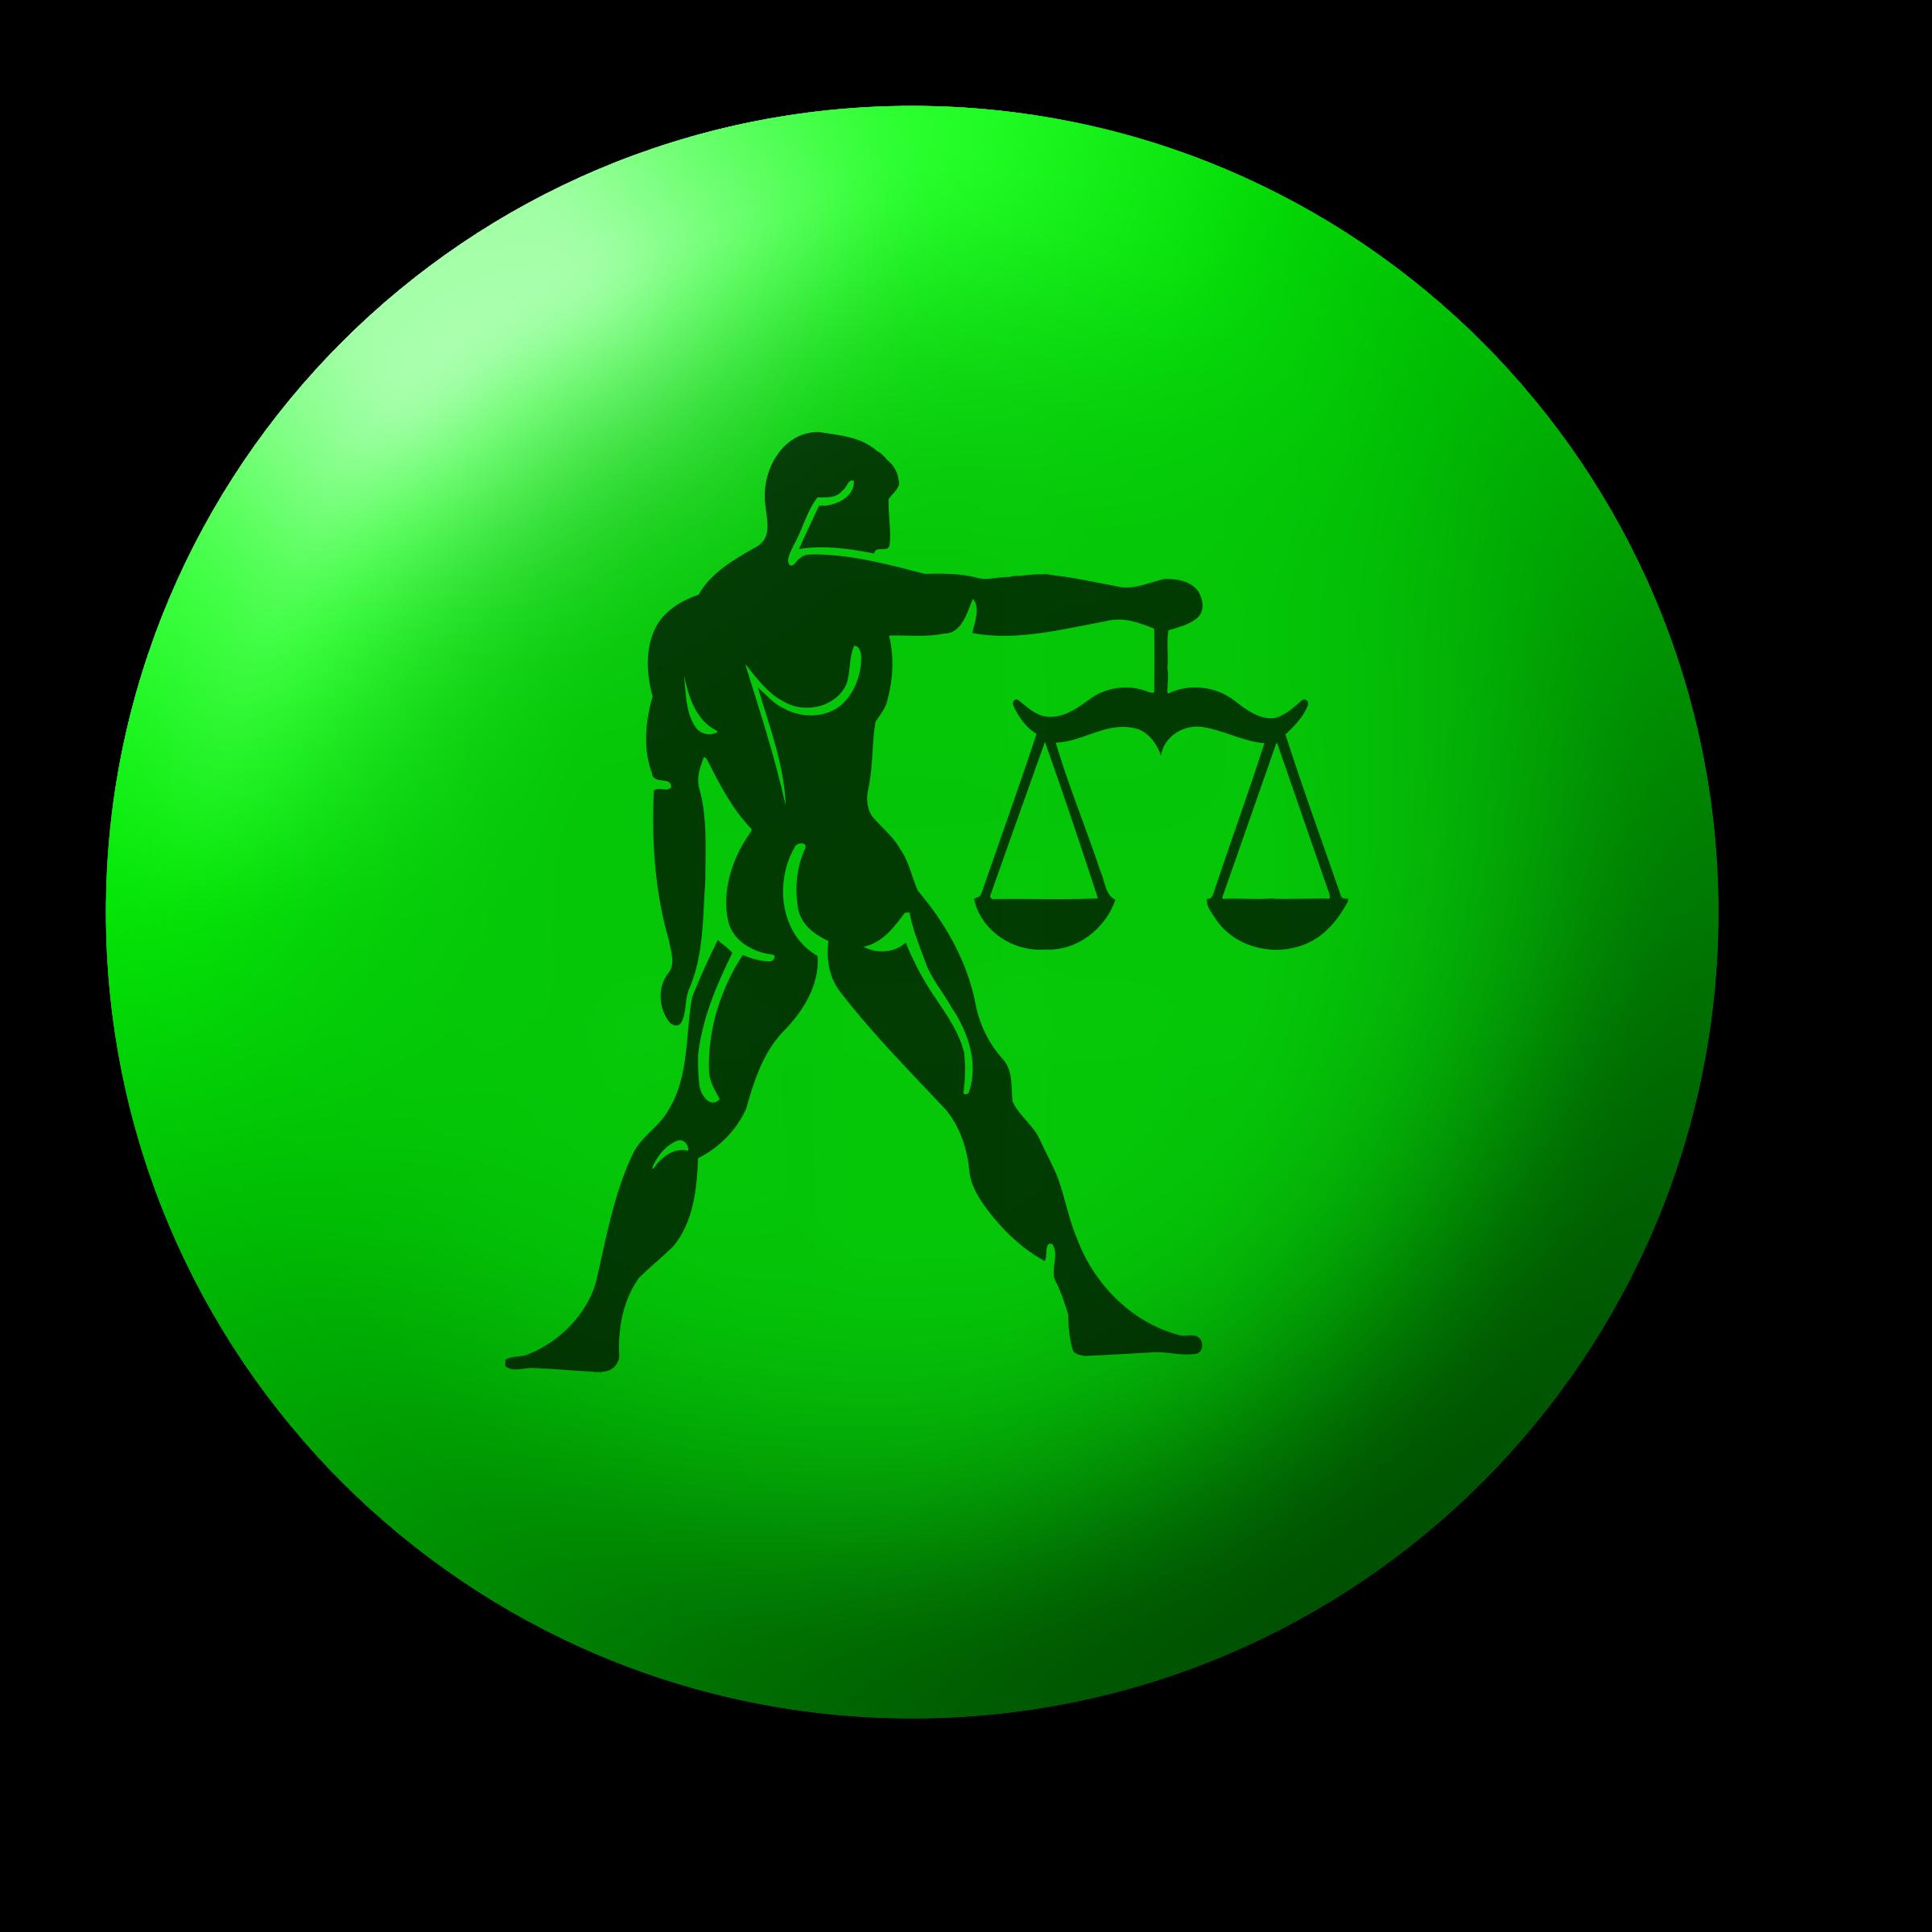 Libra drawing big image. Clipart gun green